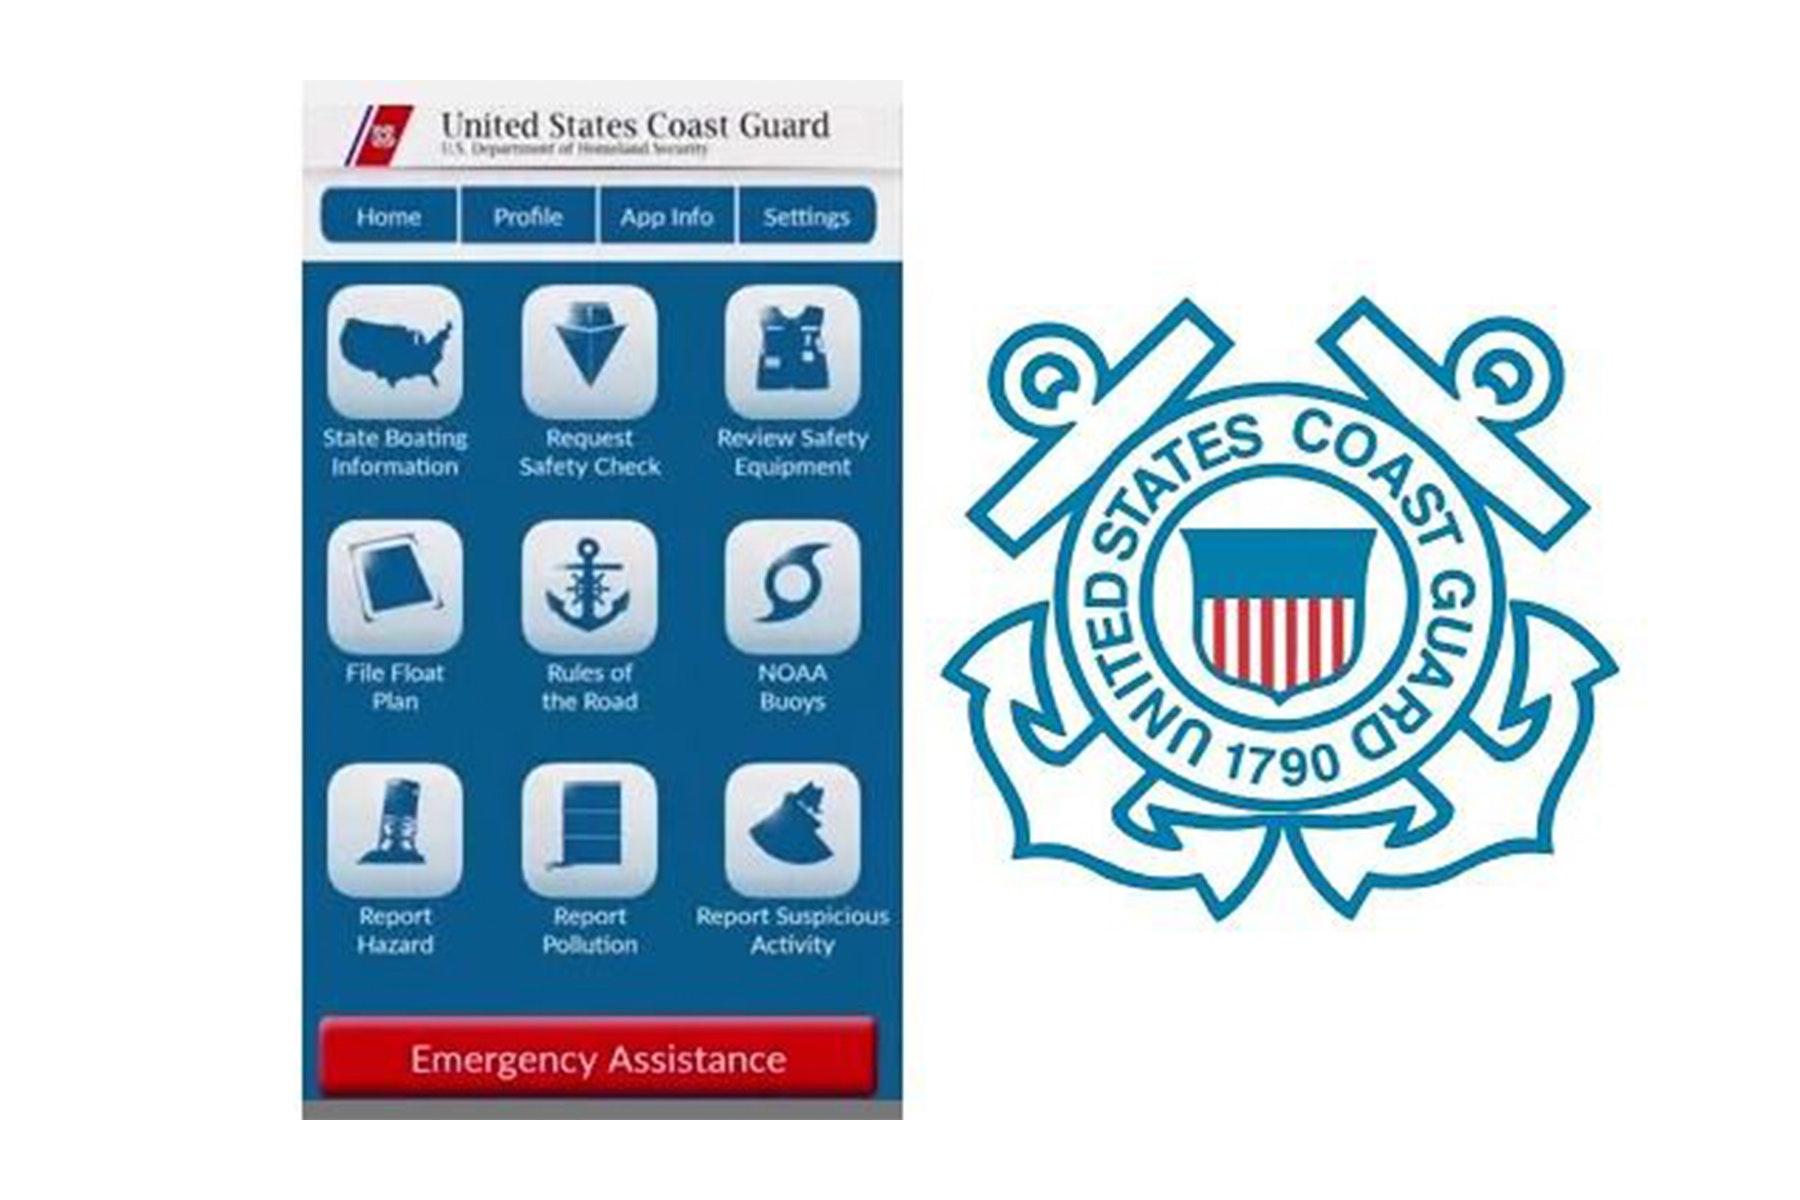 U.S Coast Guard logo with app home screen